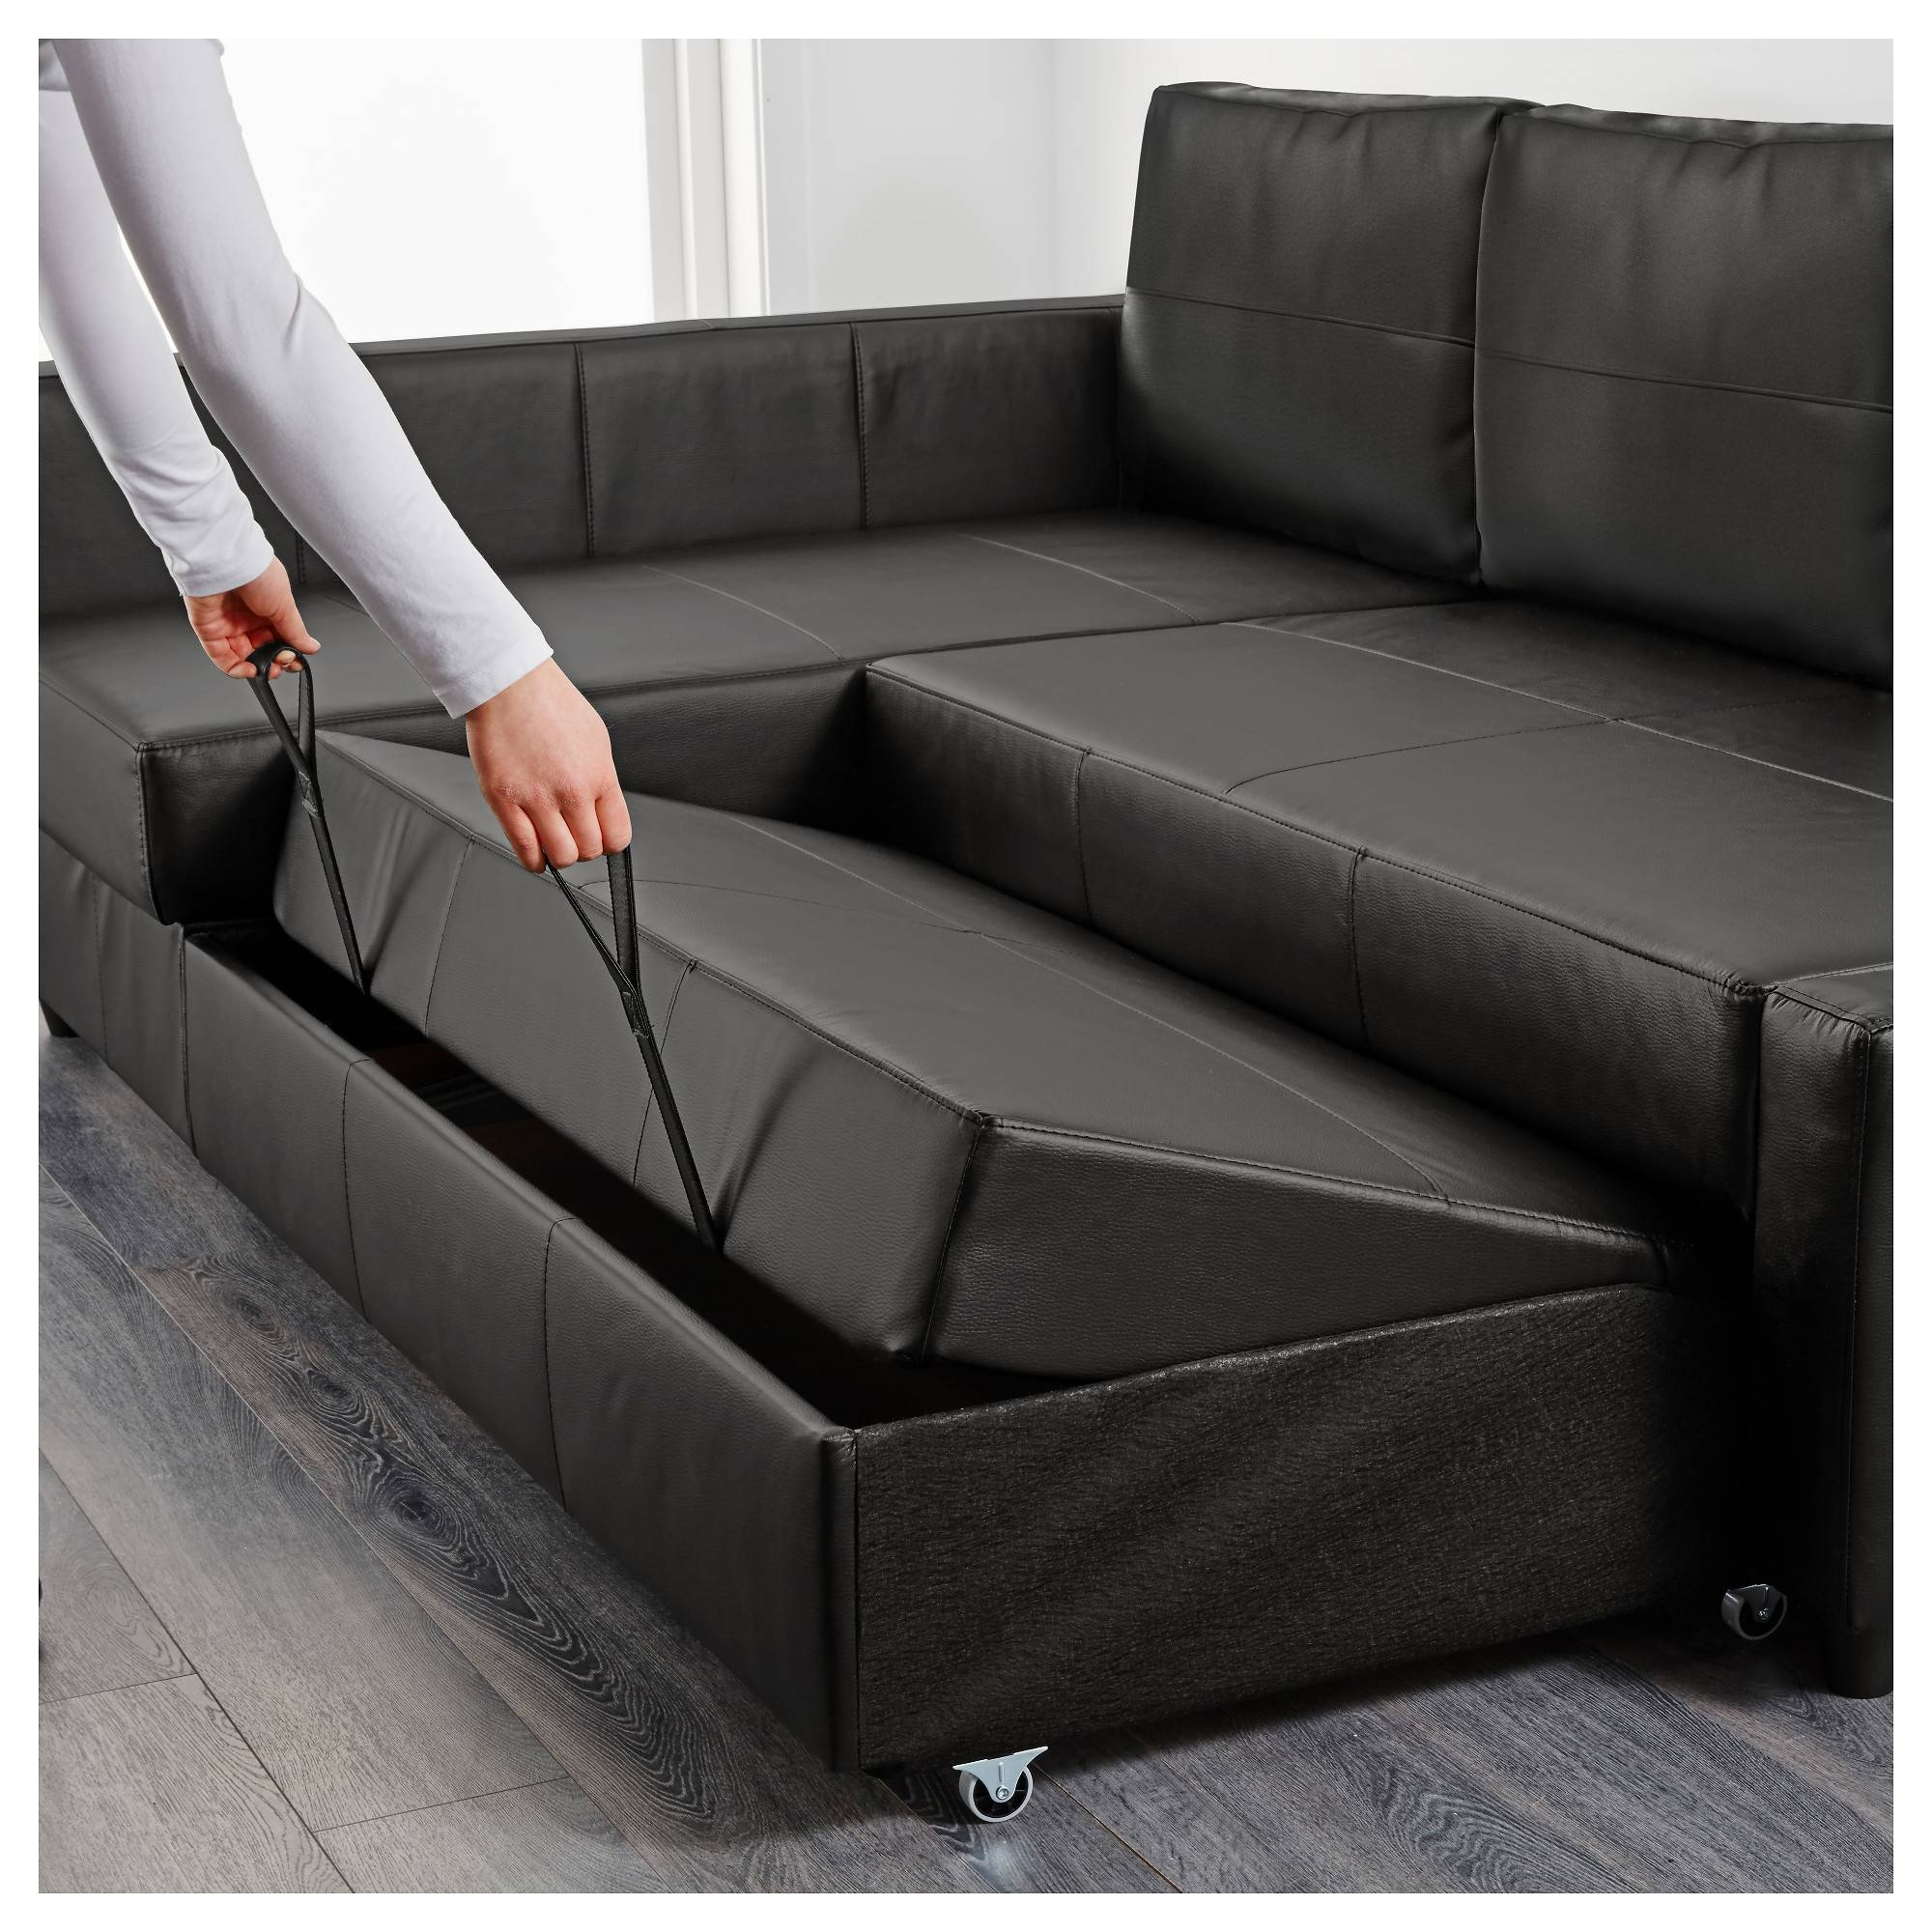 Ikea Lugnvik Sofa Bed Sleeper: 25 Best Collection Of Storage Sofa Ikea